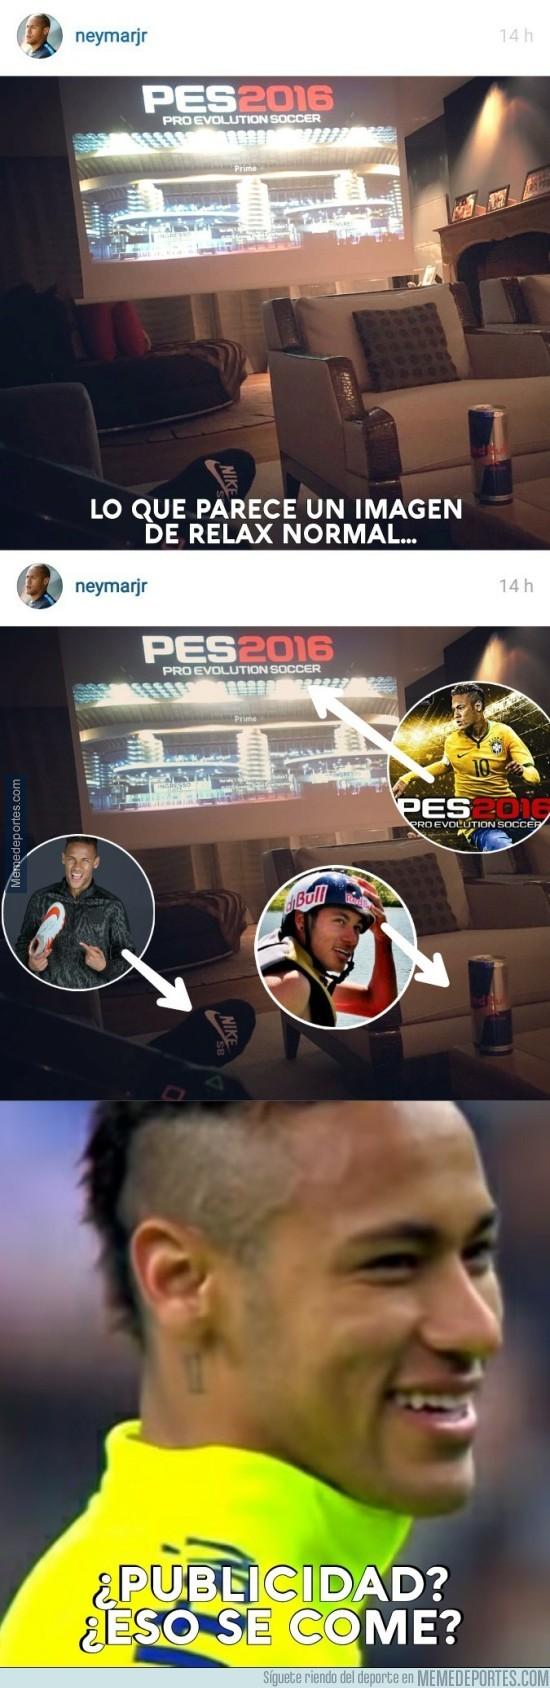 744978 - Neymar lo tiene todo planeado